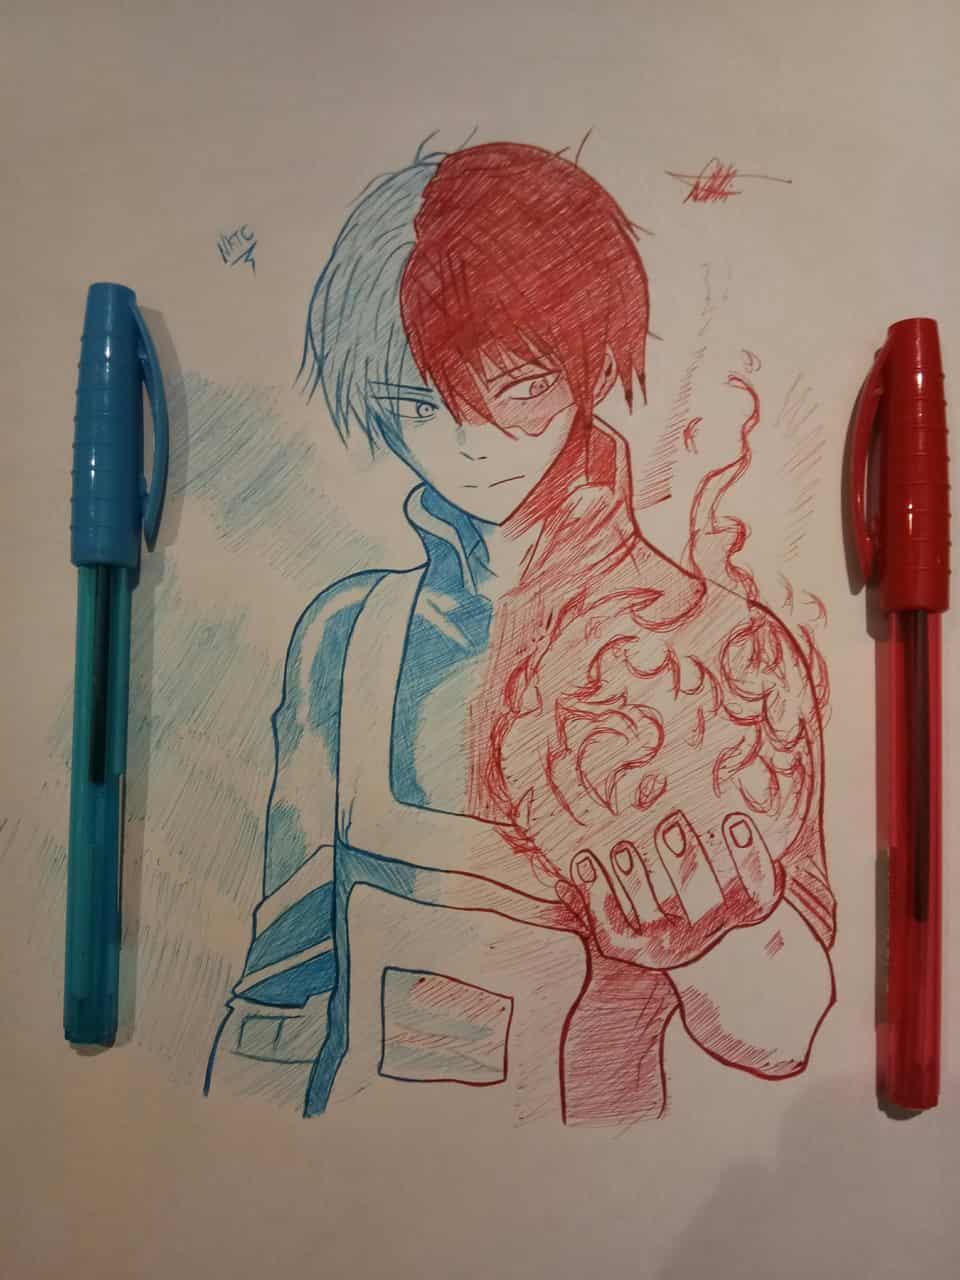 Shoto Todoroki of Boku no hero Academia Illust of Kai_cheewah.1 anime academia drawing MyHeroAcademia traditional manga art hero 神 my